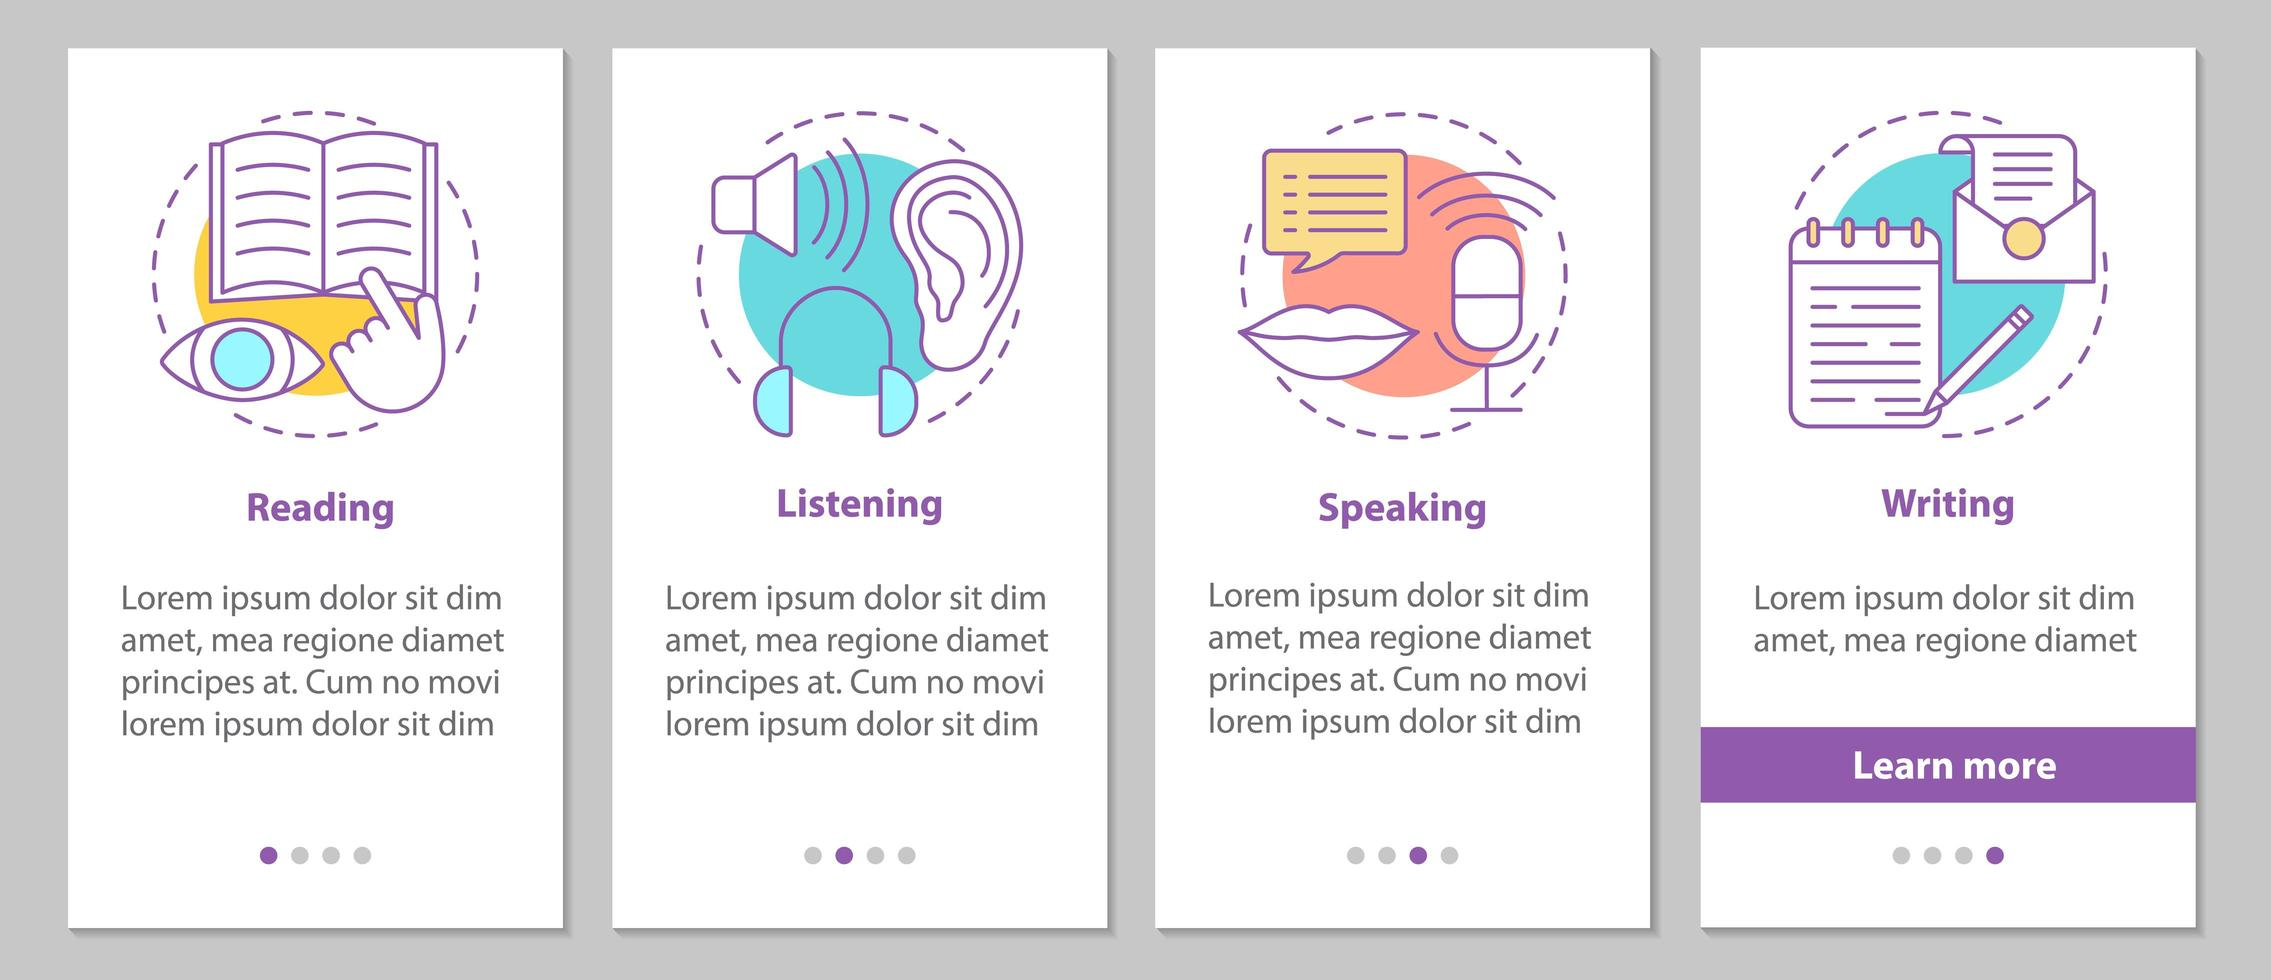 grundläggande språkkunskaper ombordskärmar vektor